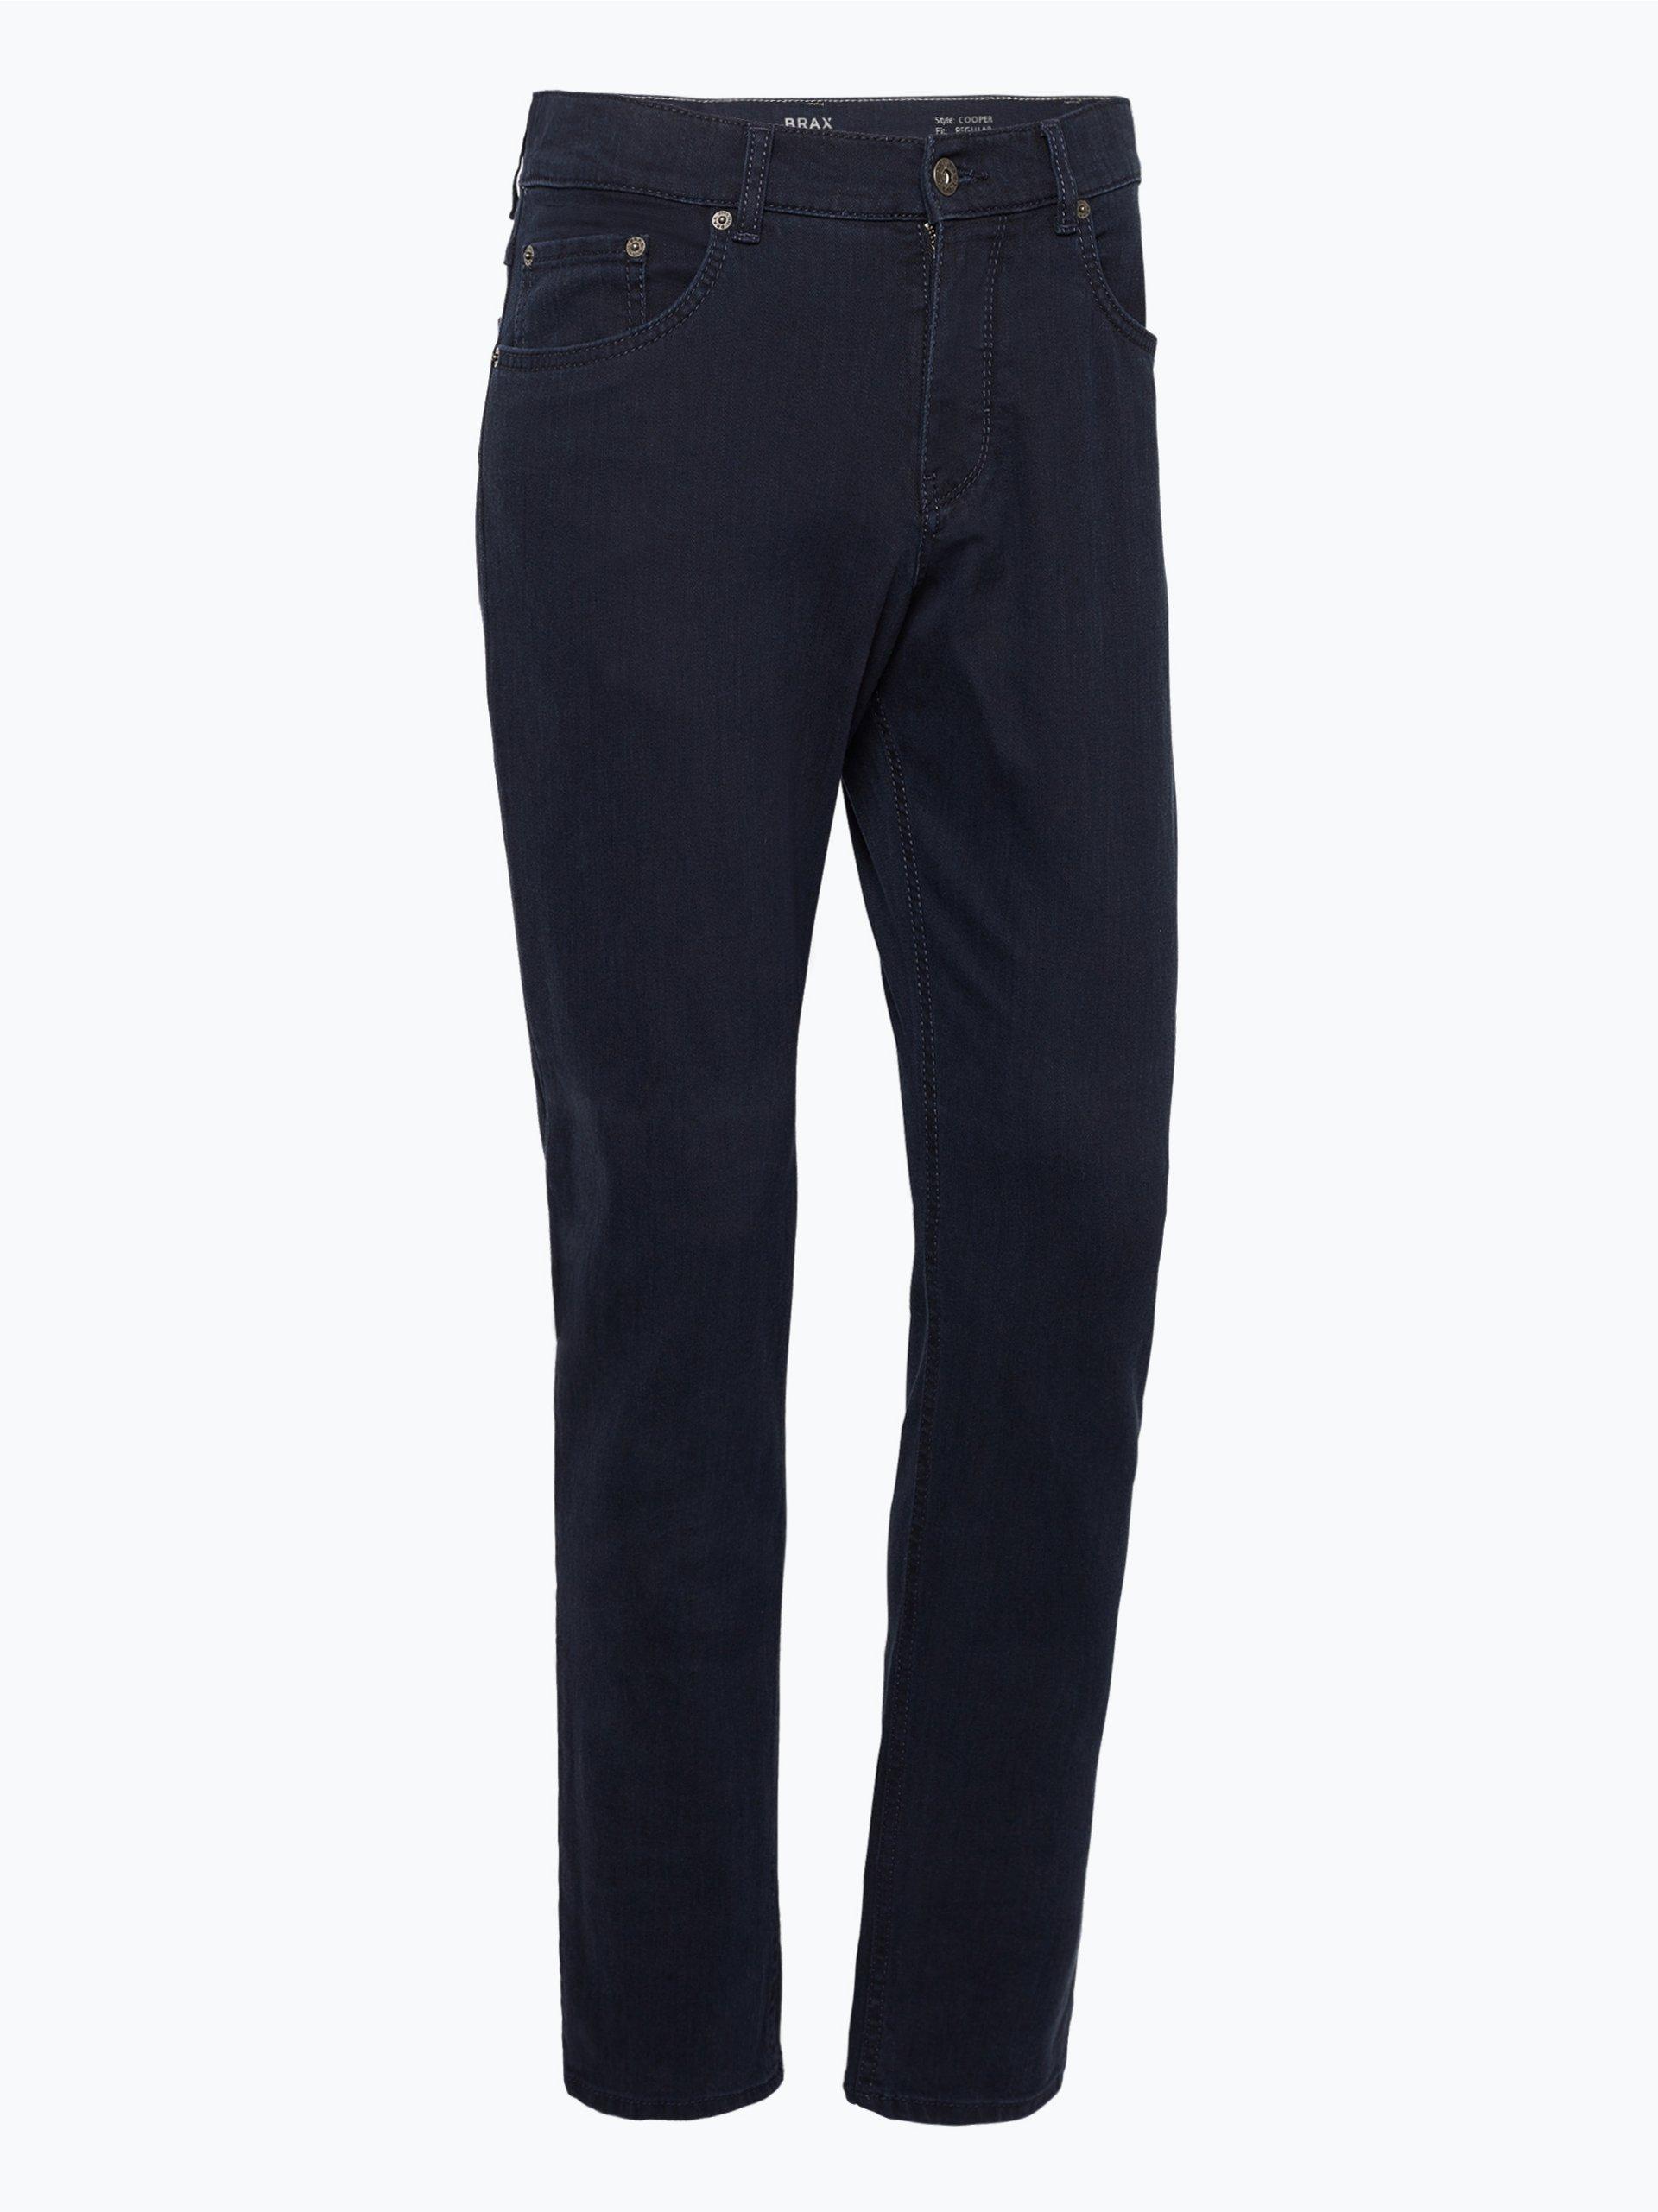 brax herren jeans cooper marine uni online kaufen peek. Black Bedroom Furniture Sets. Home Design Ideas